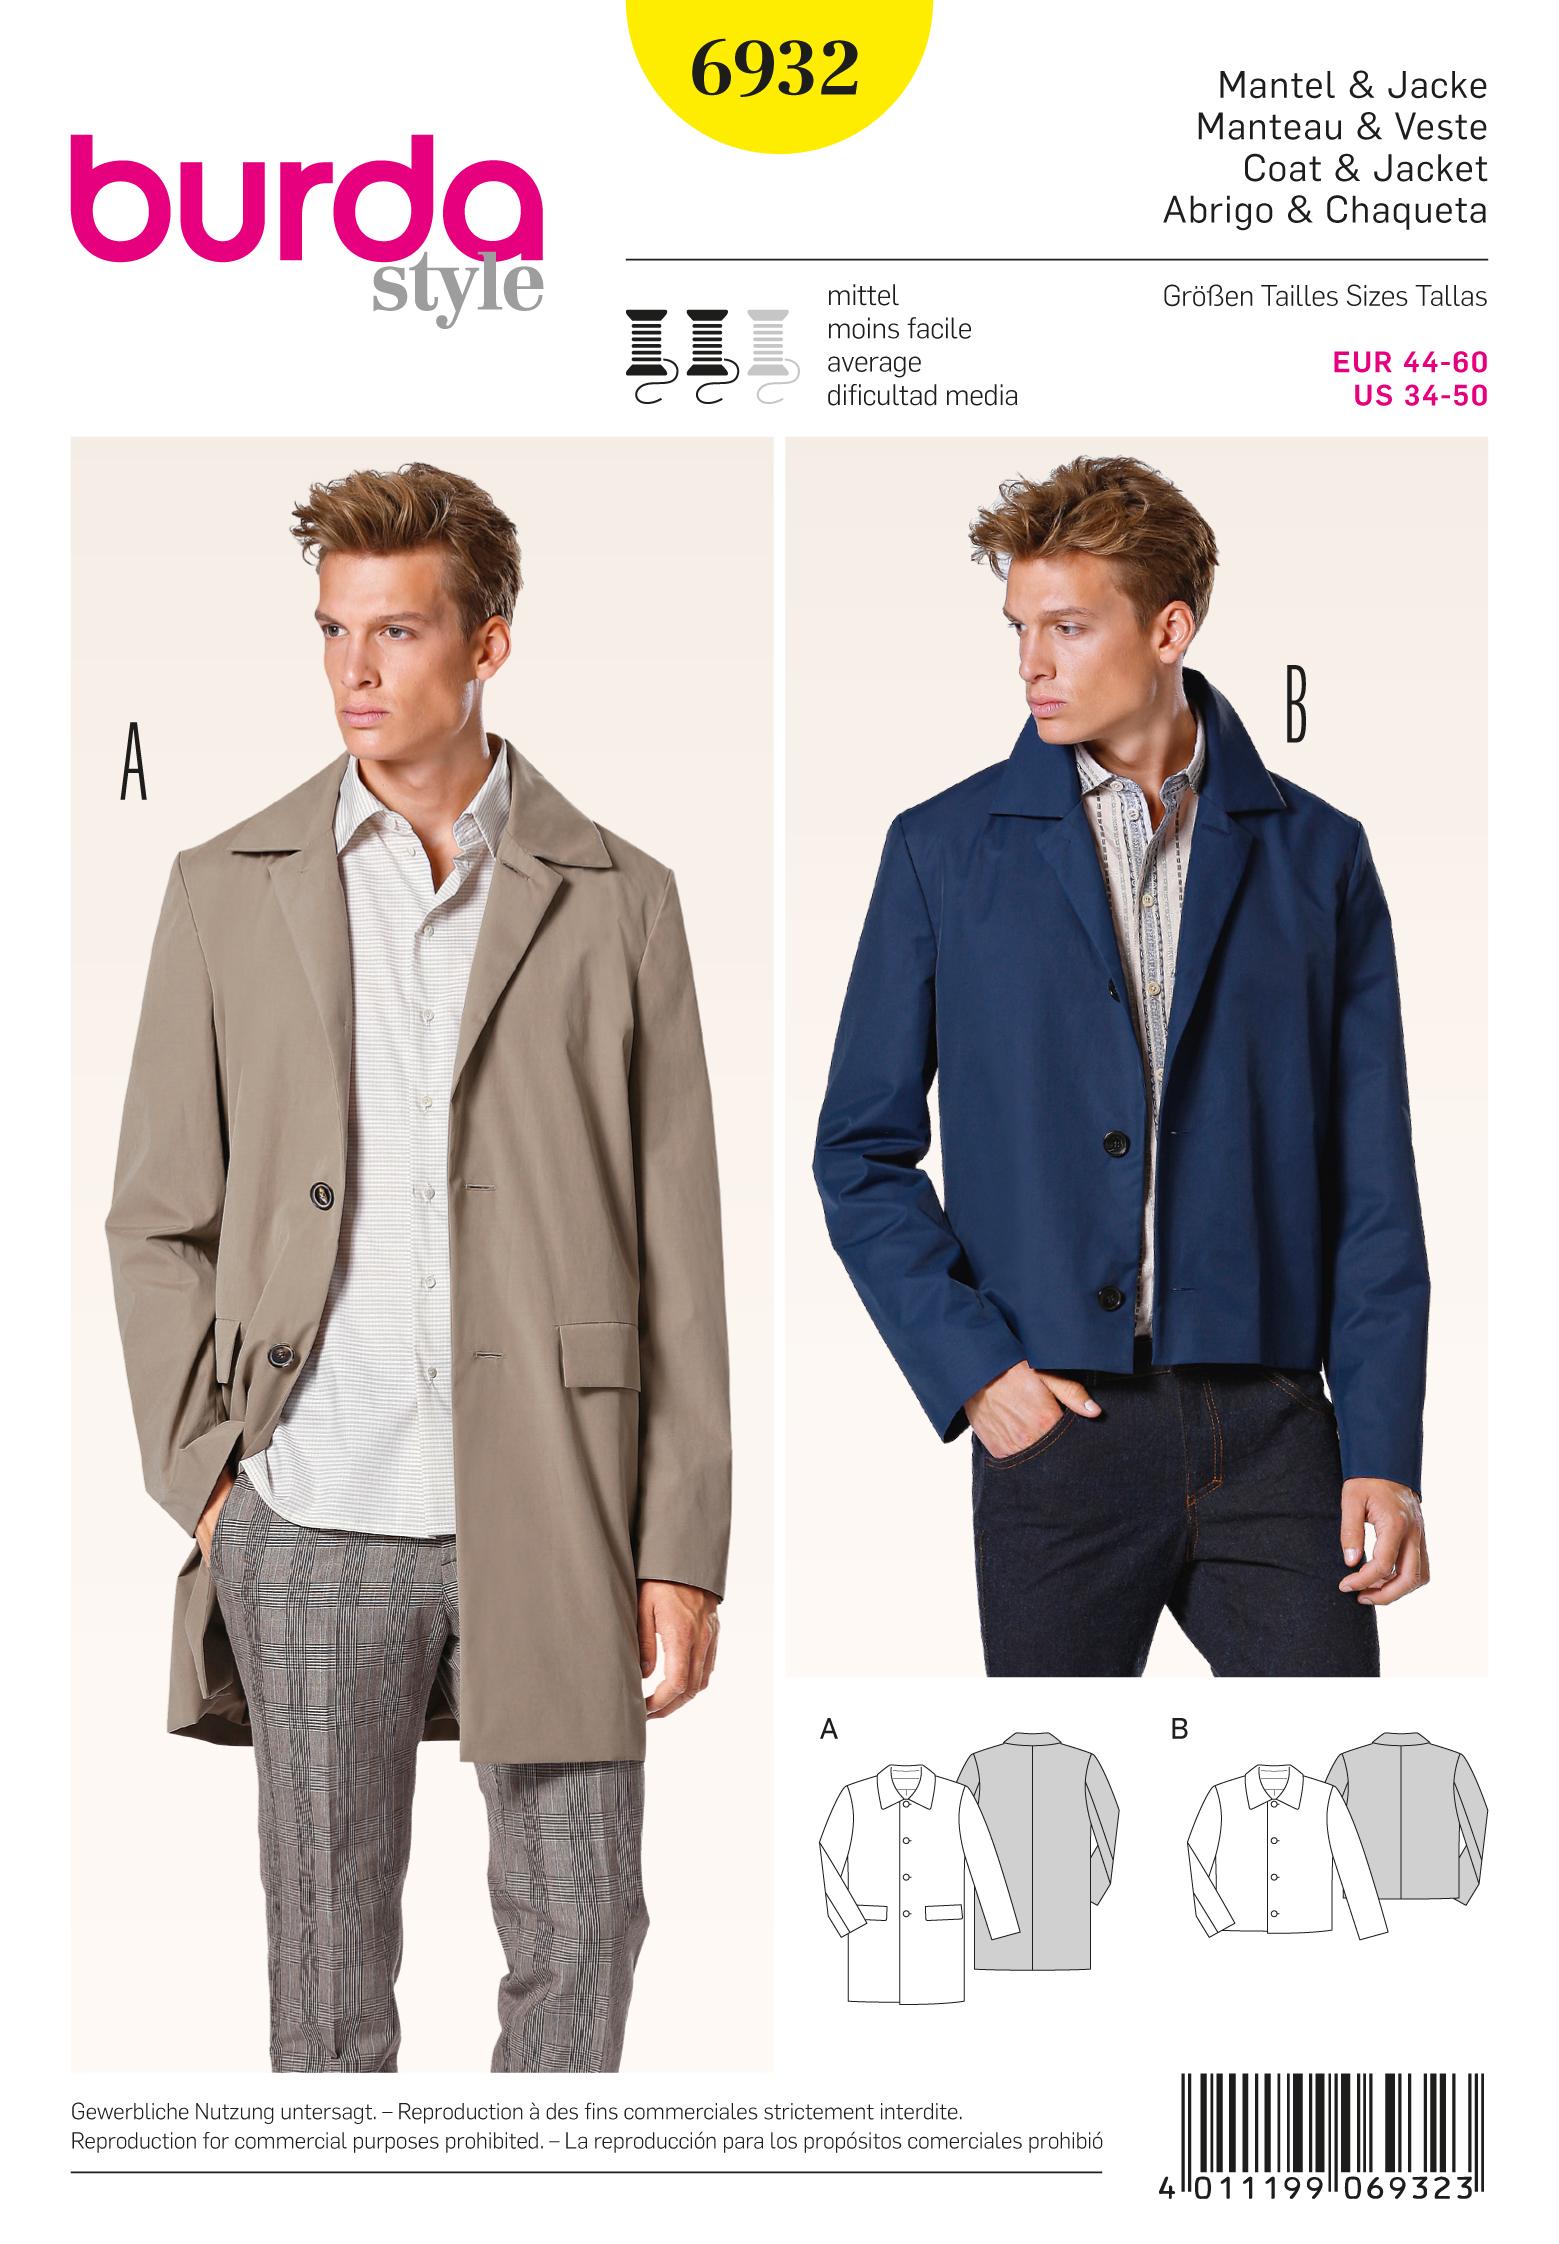 Burda Menswear 6932